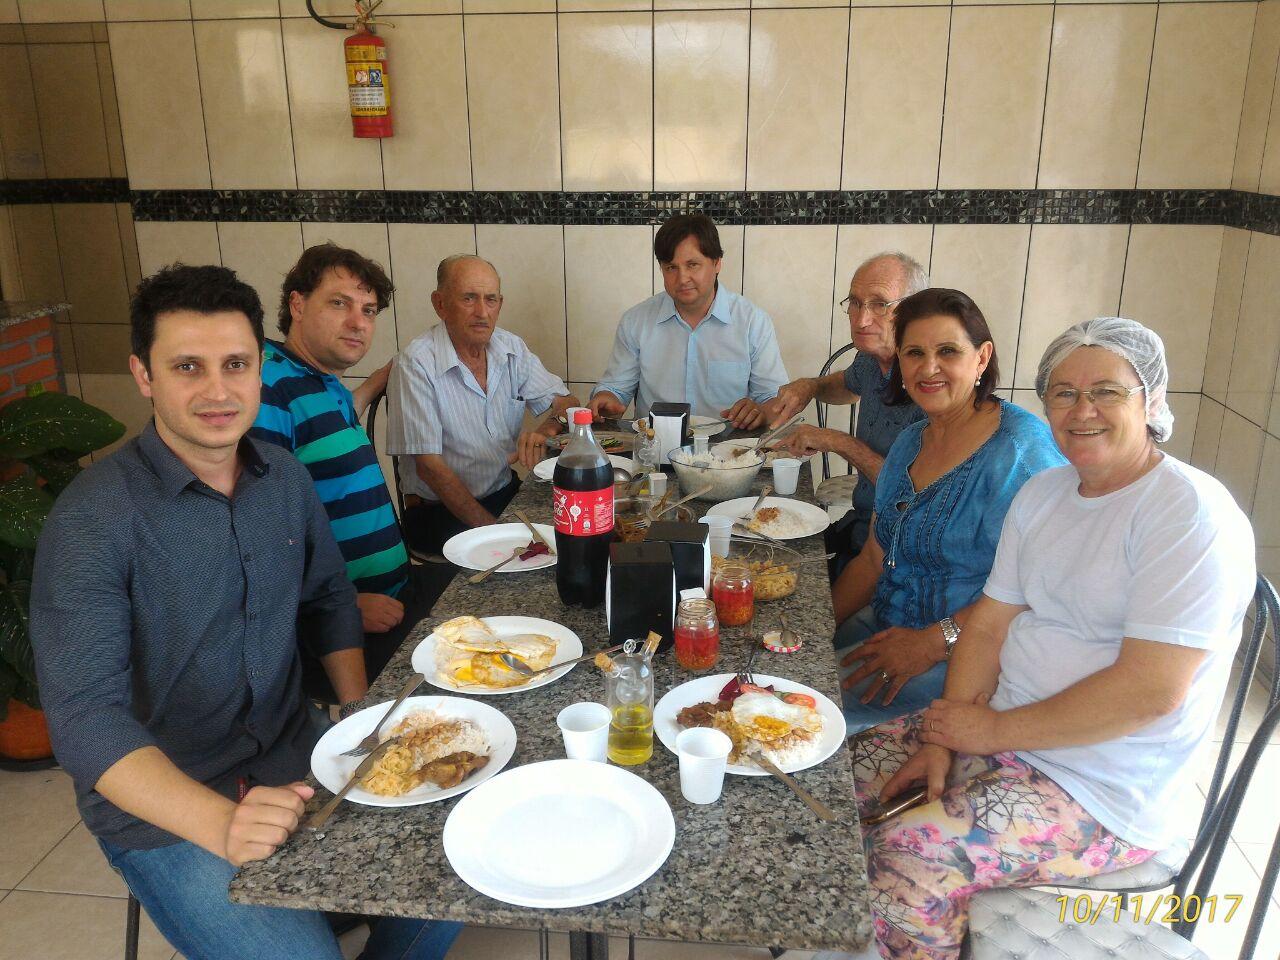 Anibelli Neto visita o amigo prefeito Rodrigo do PMDB de Ourizona